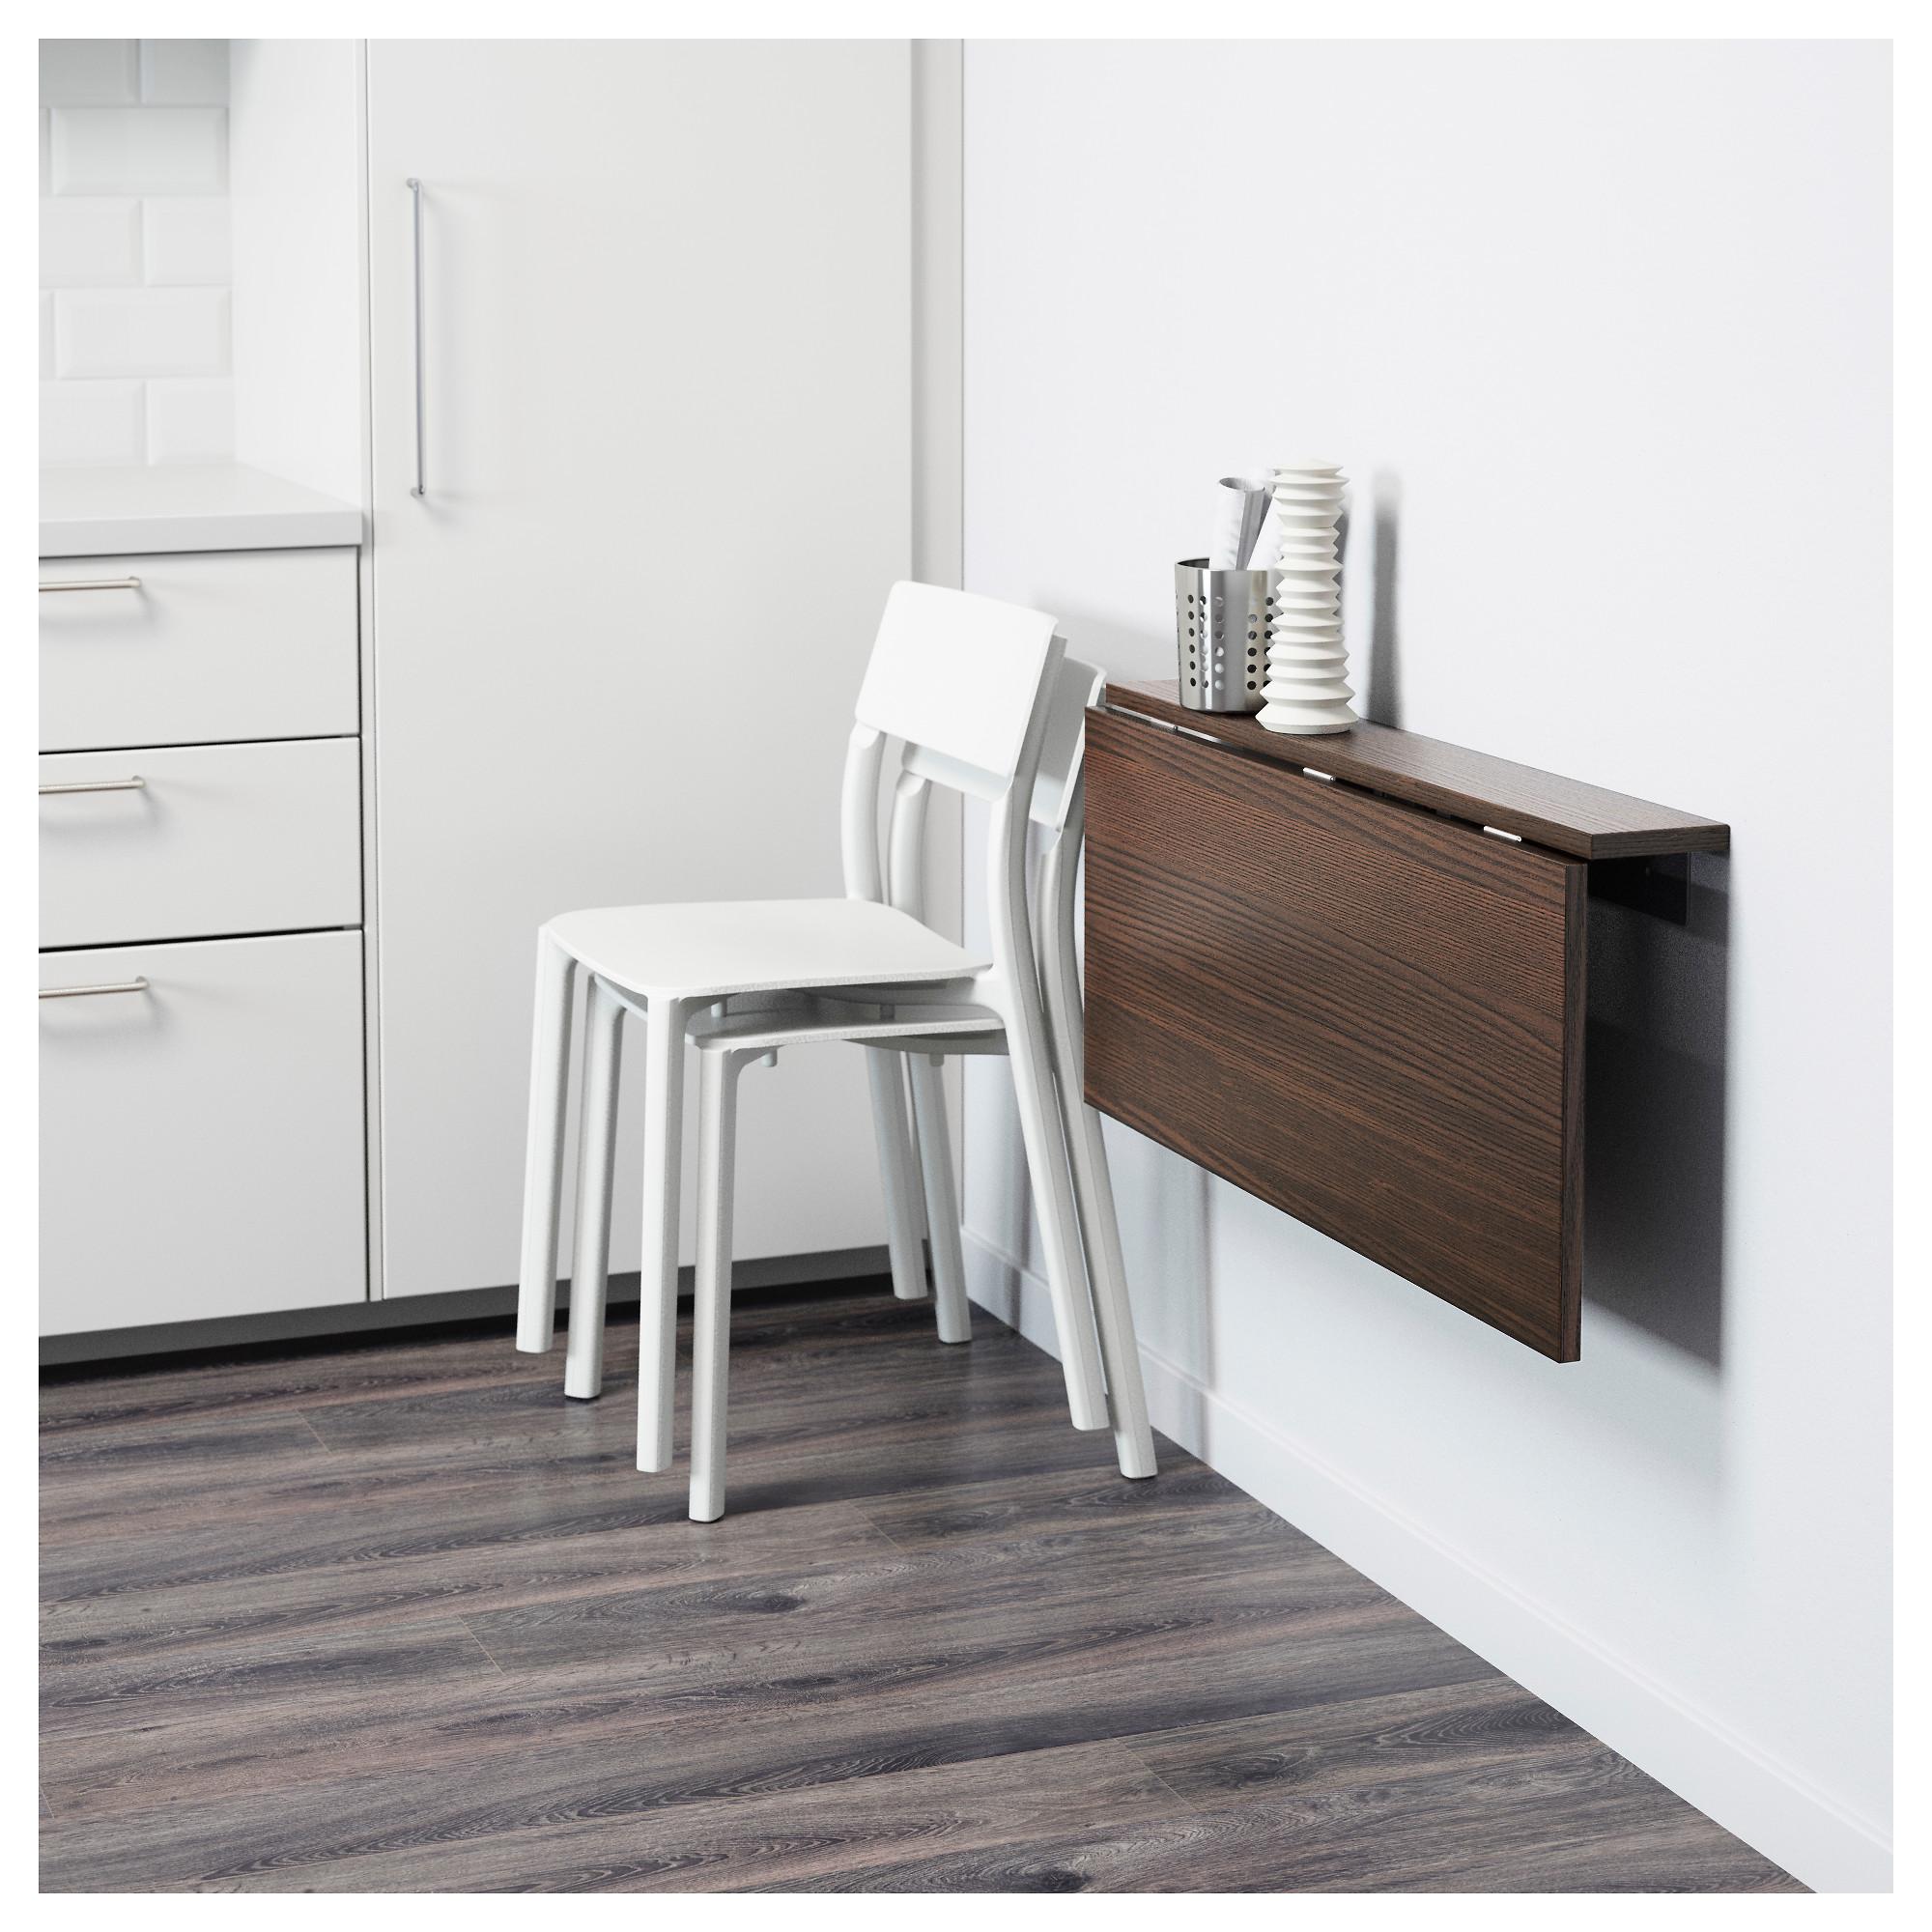 Ikea spulenschrank 50